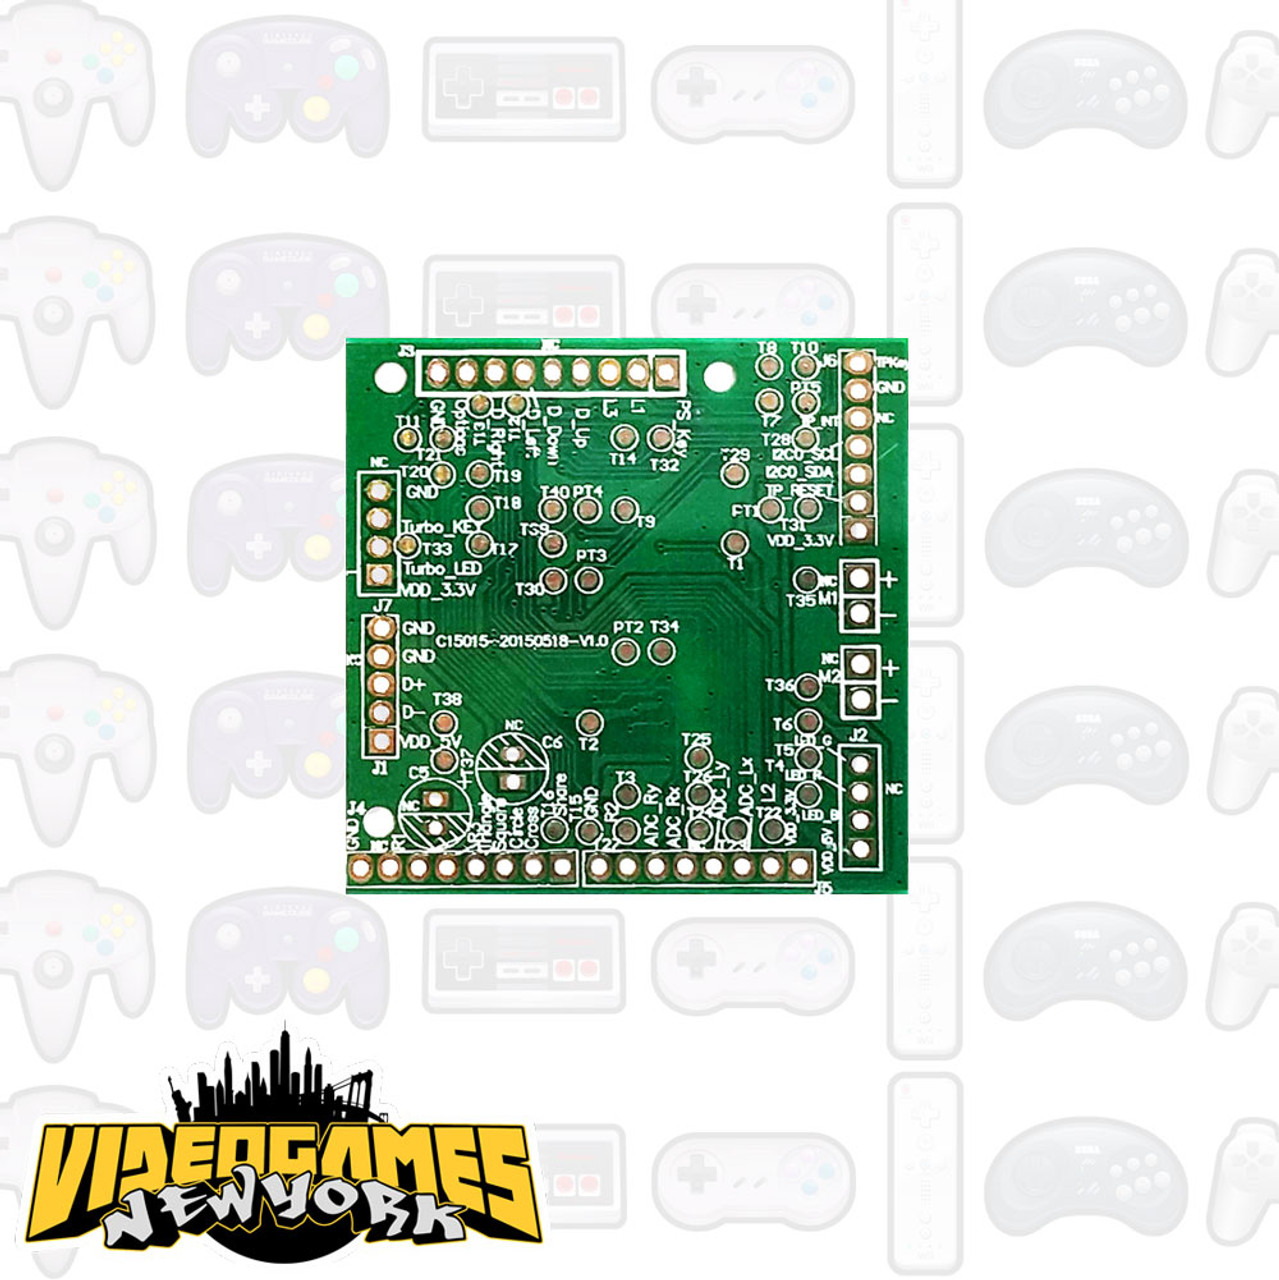 Brook PS3/PS4 Fighting Board PCB - Videogamesnewyork